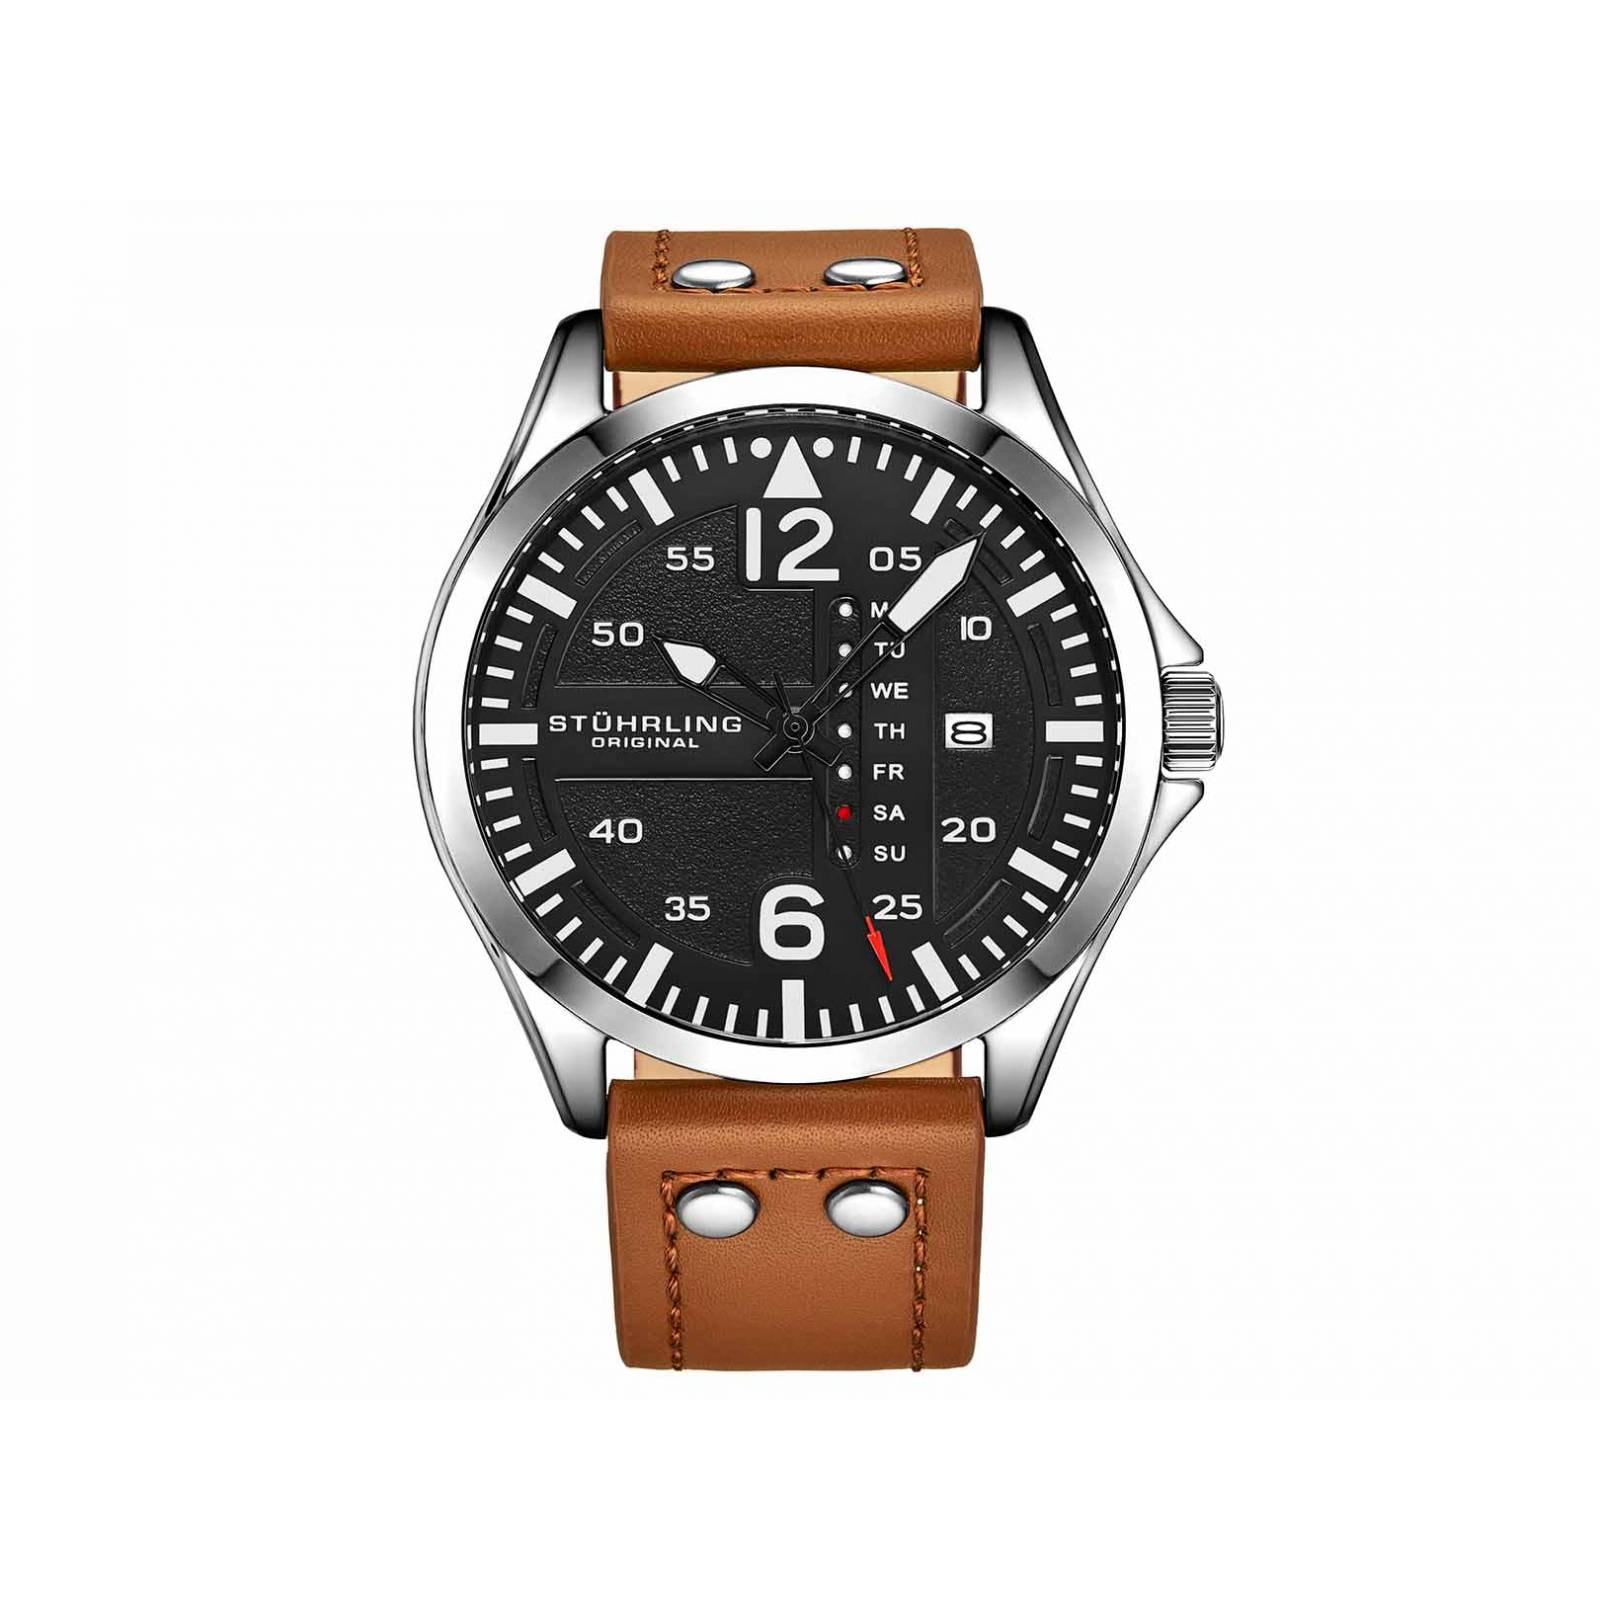 e8630ad925cf Reloj stührling modelo aviator-caballero